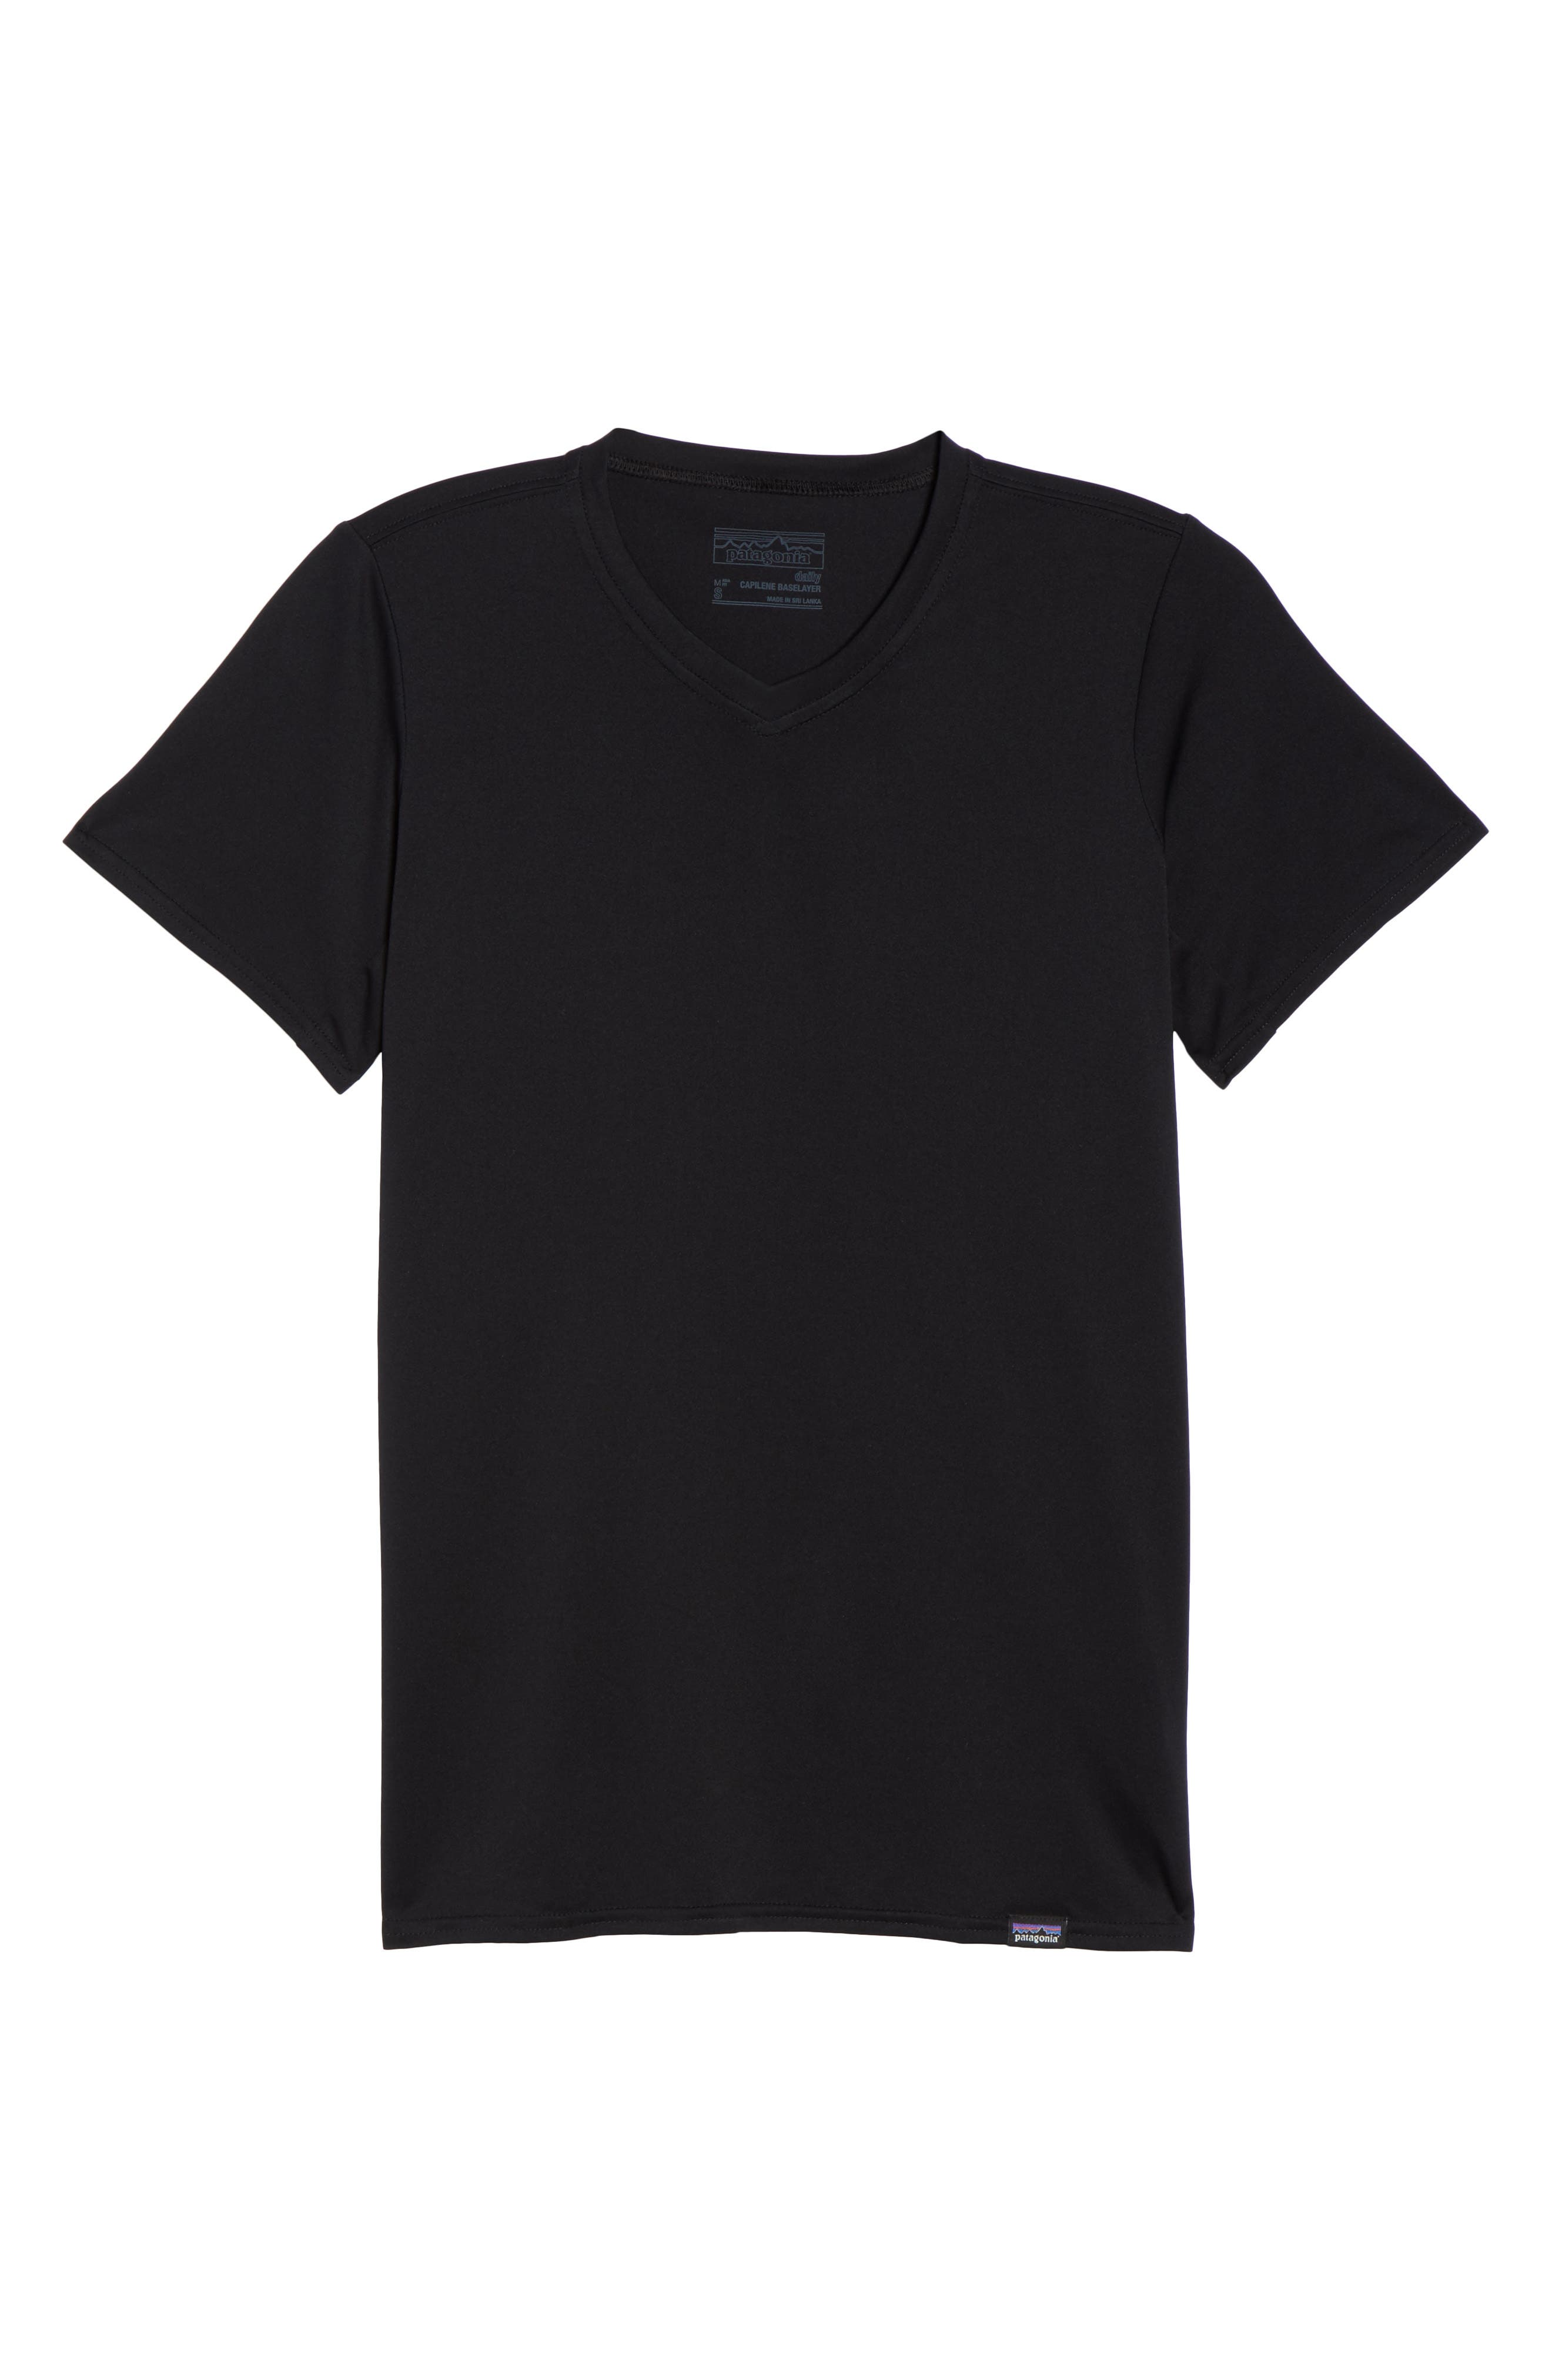 Capilene<sup>®</sup> Dailty T-Shirt,                             Alternate thumbnail 7, color,                             Black